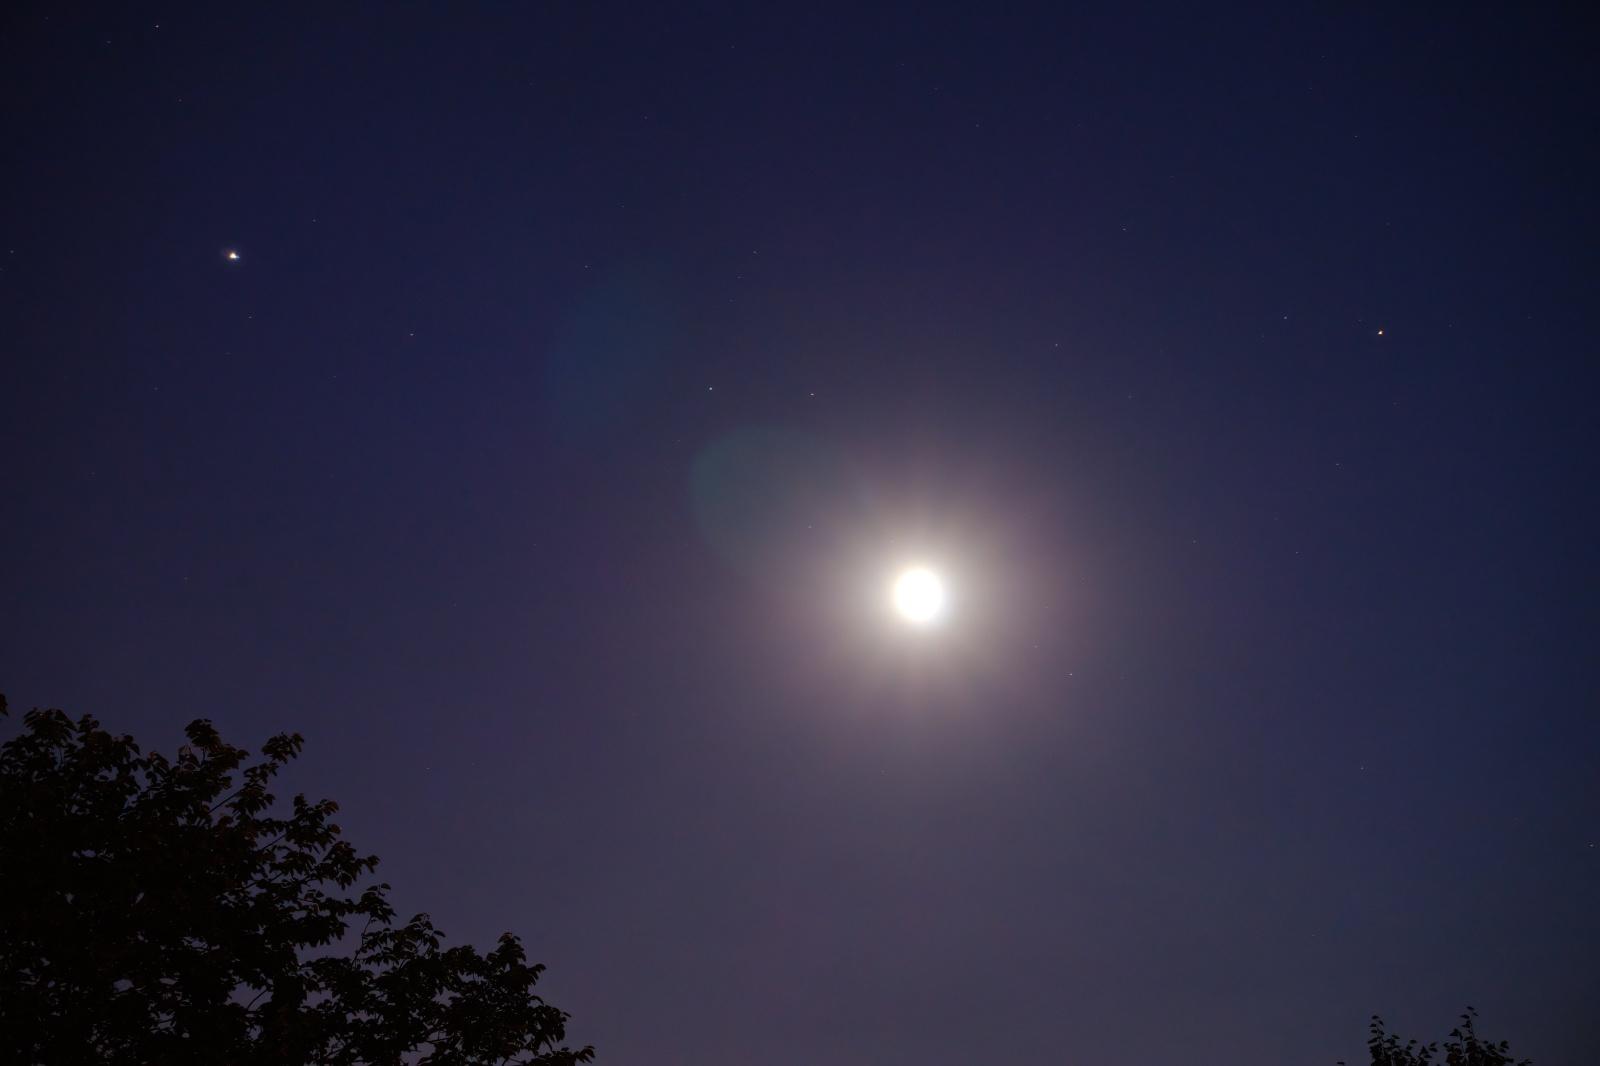 moon-2021-06-28--001.thumb.jpg.0457a8e8fcf7f360d80f31ae9b27d813.jpg